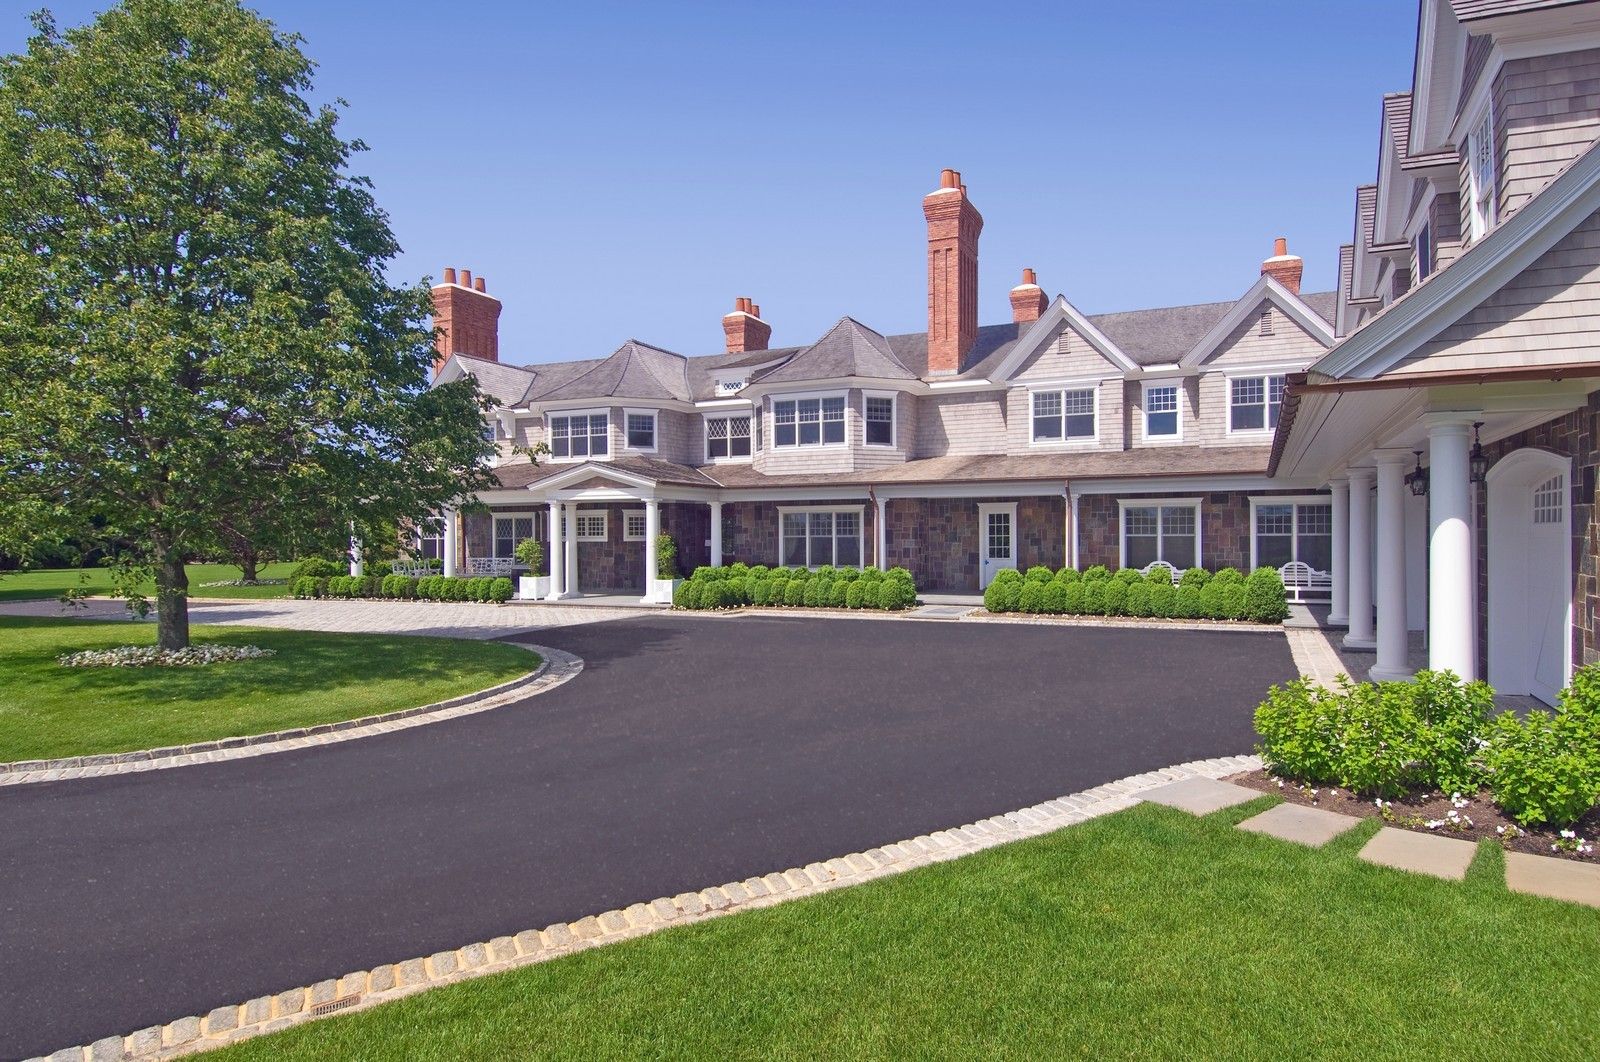 Real Estate Photography - 612 halsey lane, bridgehampton, NY, 11932 - Front View